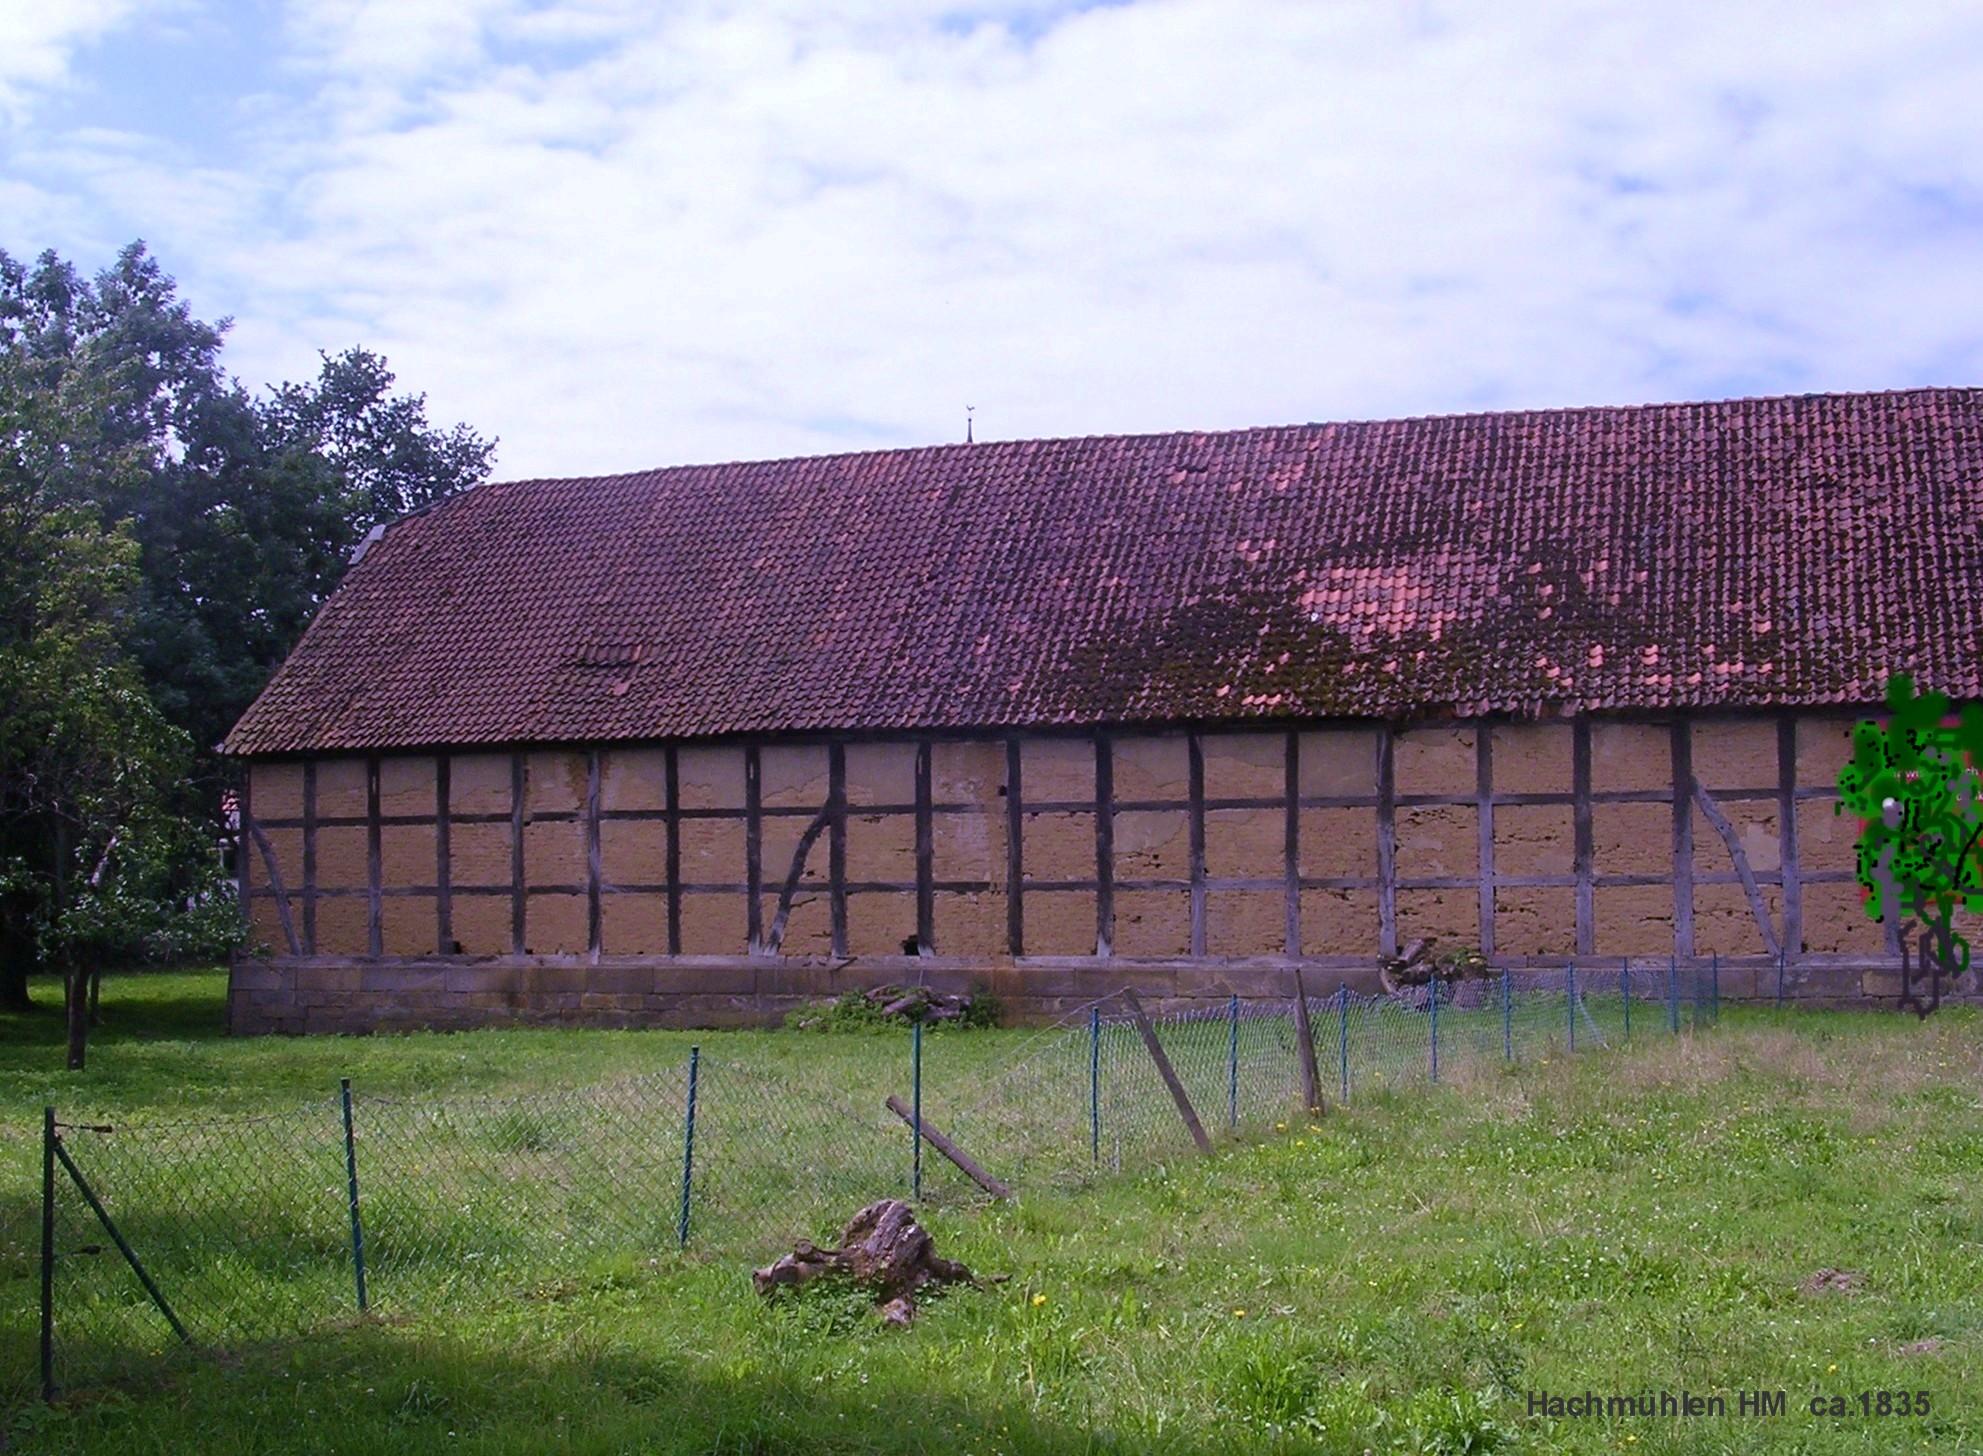 f-hachmuehlen-hm-1842